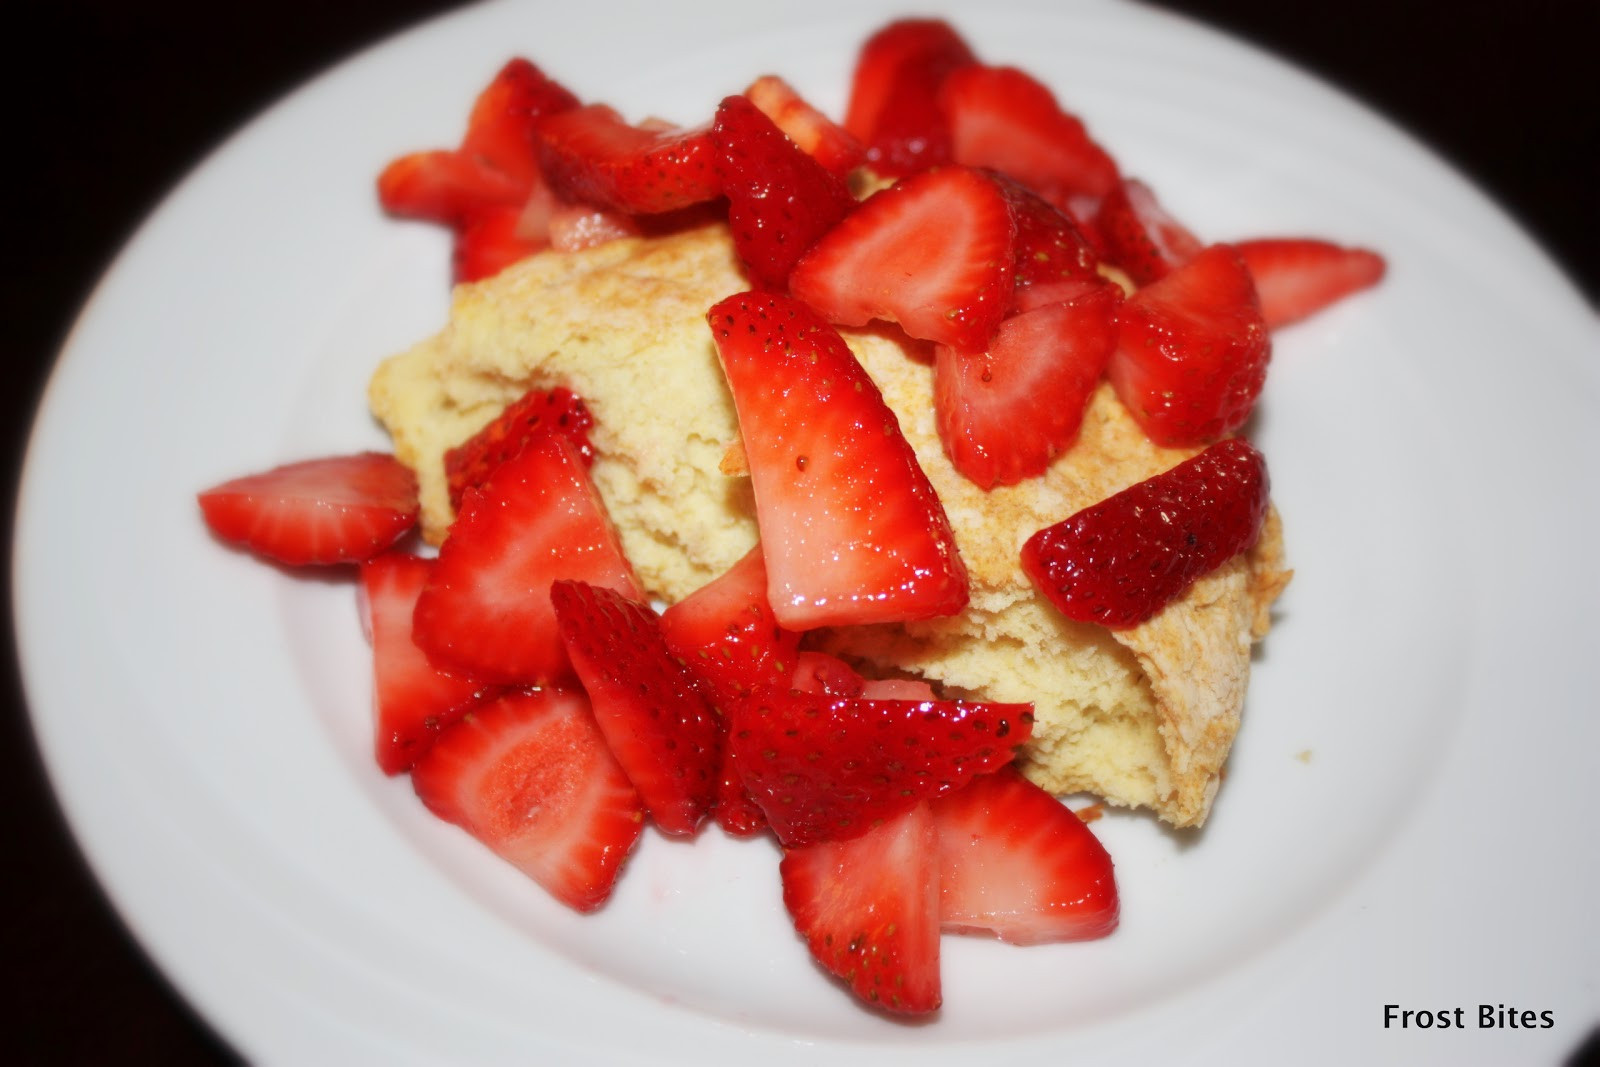 Low Fat Strawberry Shortcake  Frost Bites Healthy Strawberry Shortcake